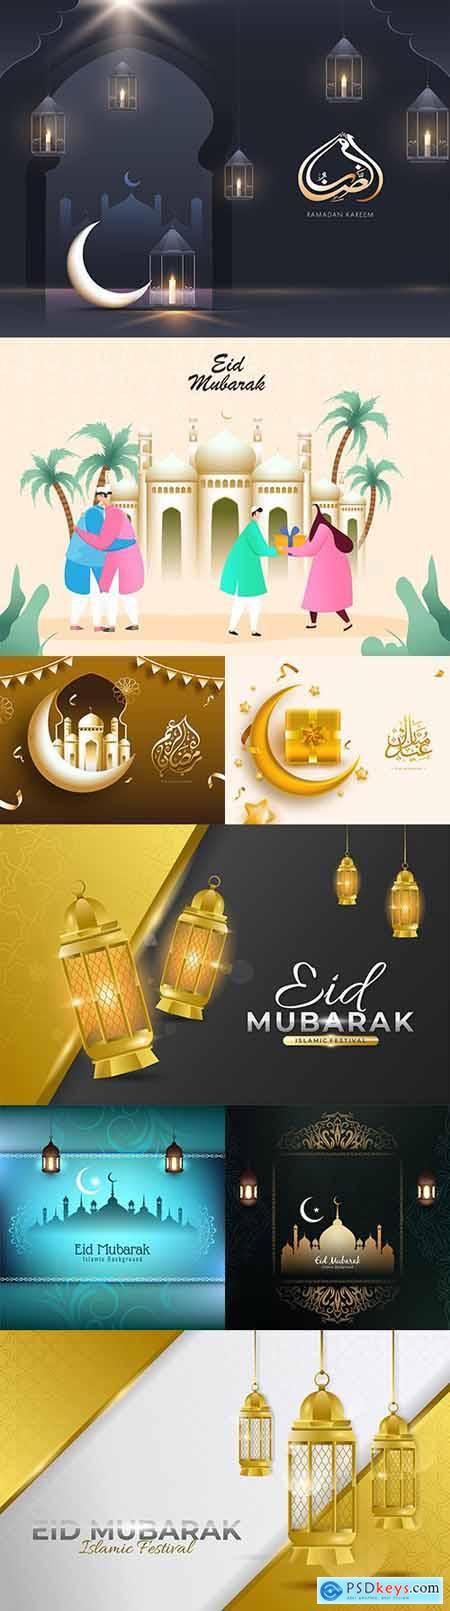 Ramadan Kareem and Eid Mubarak background Islamic 5